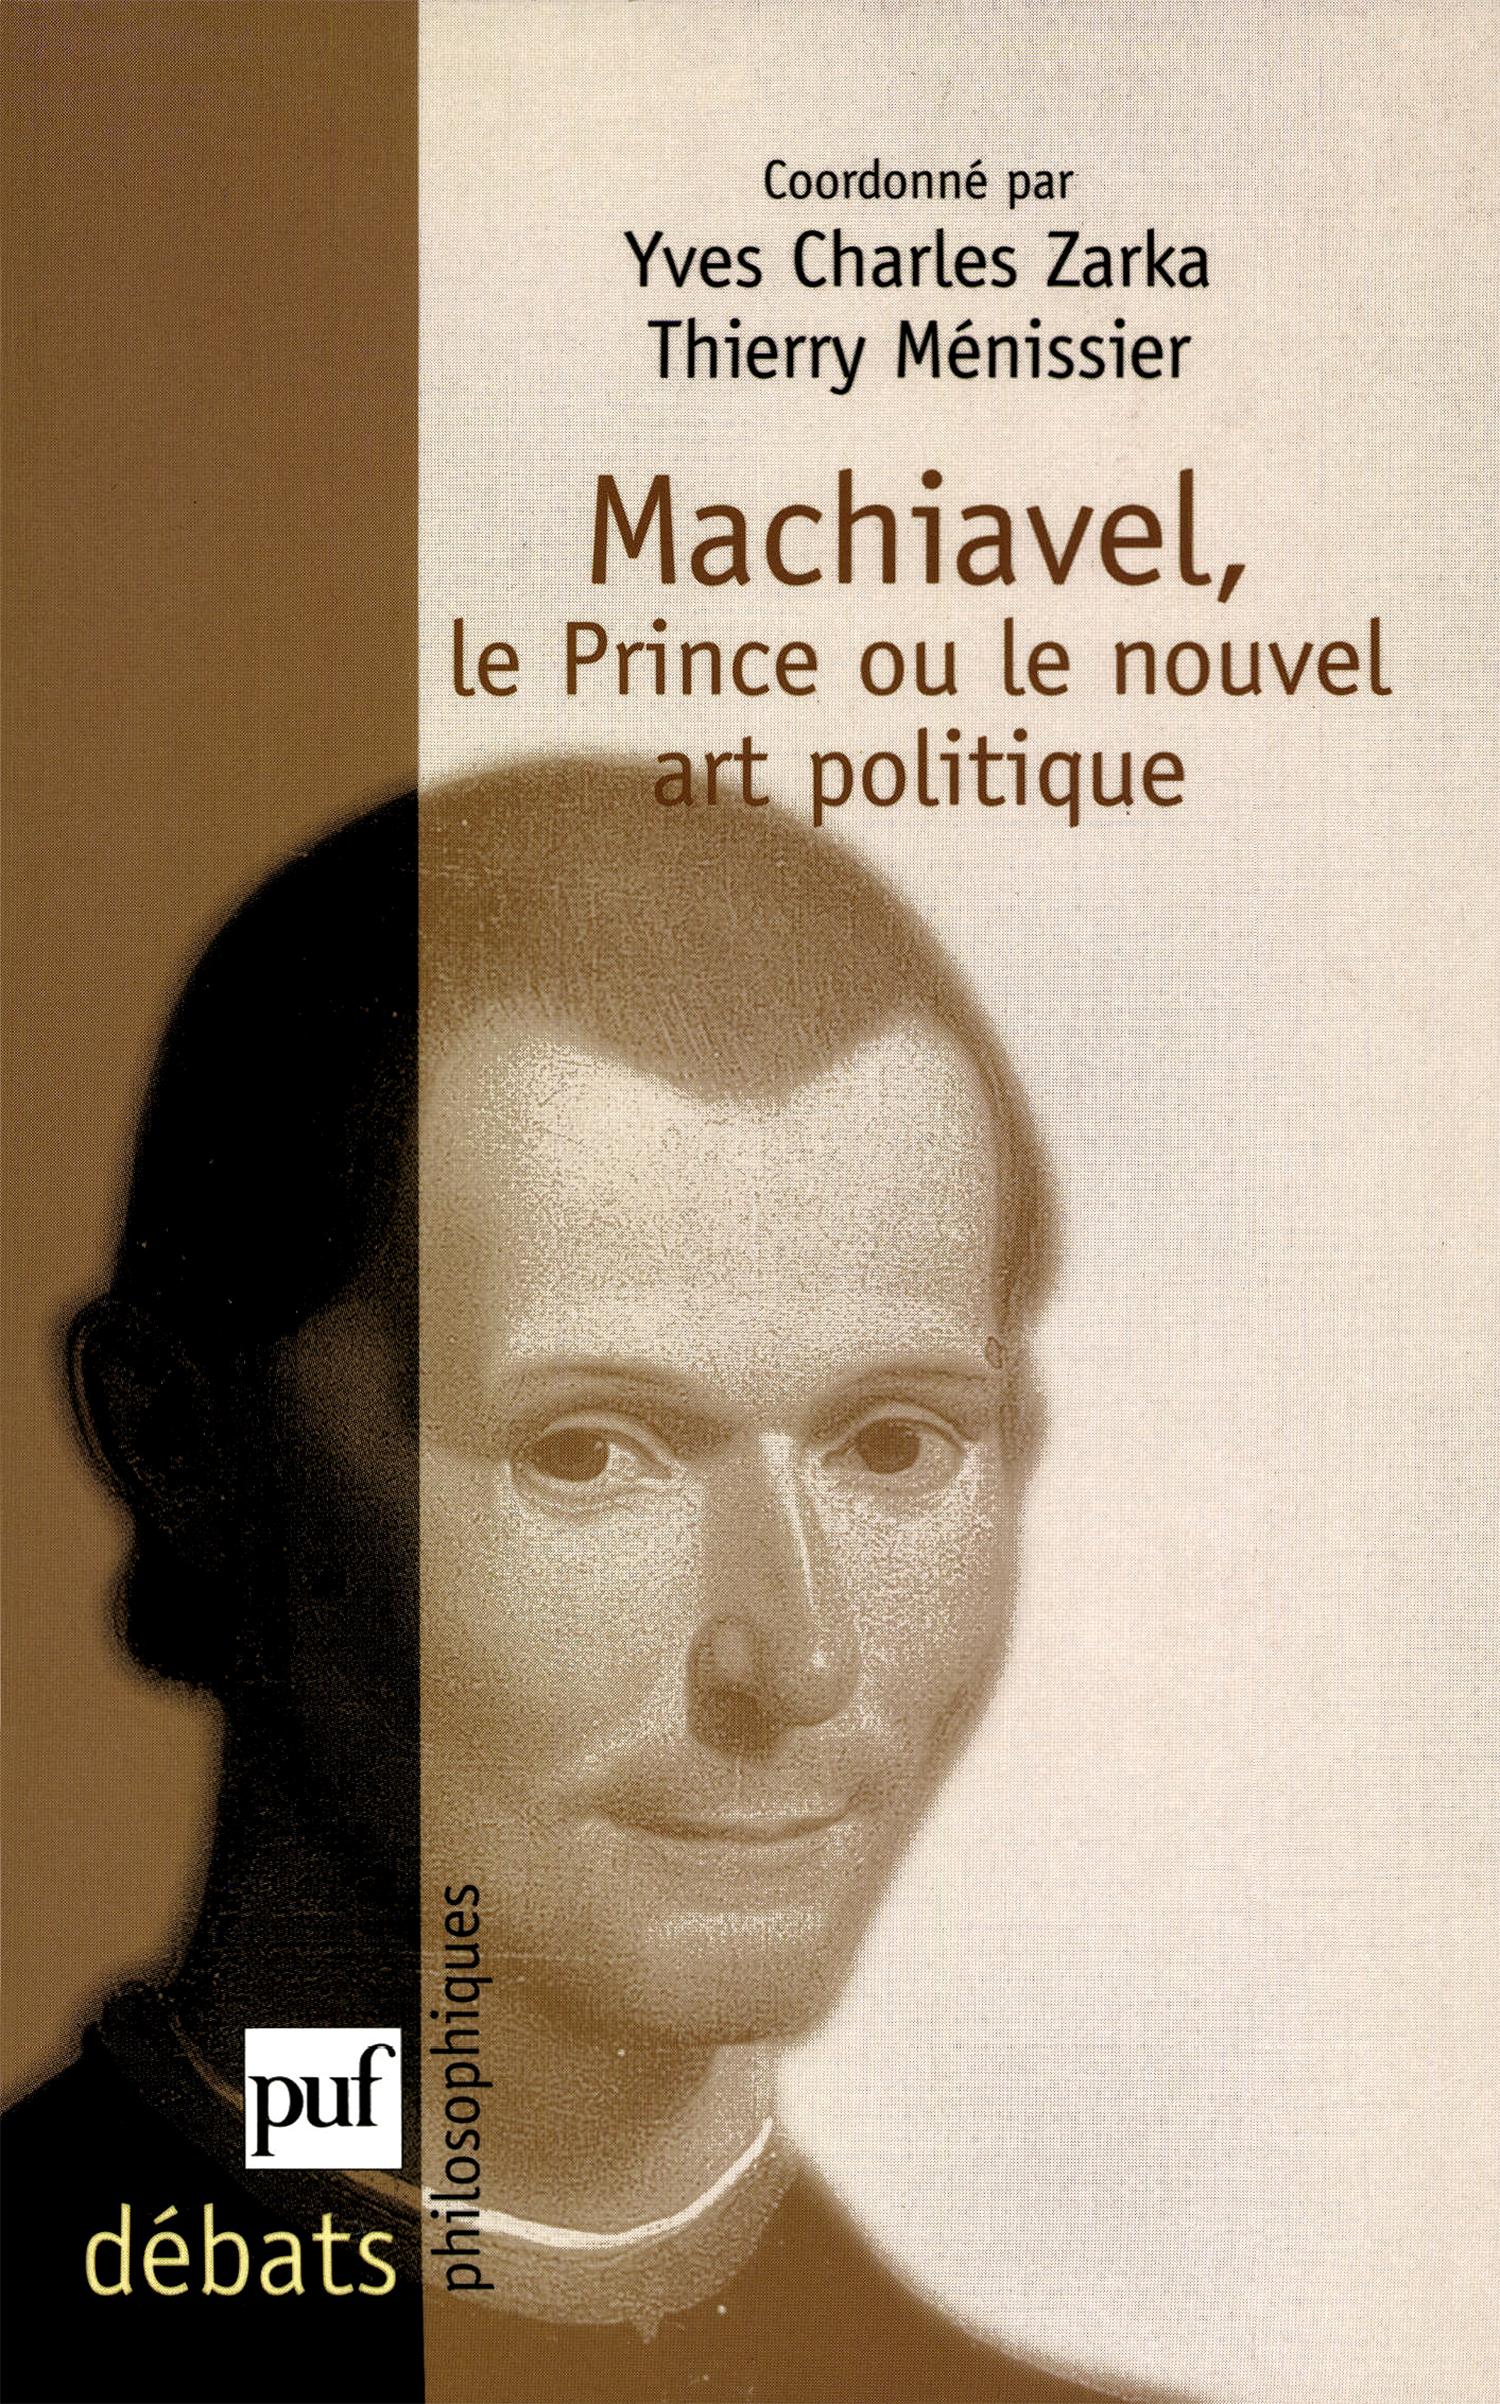 Machiavel Yves Charles Zarka Et Thierry Ménissier Cairn Info